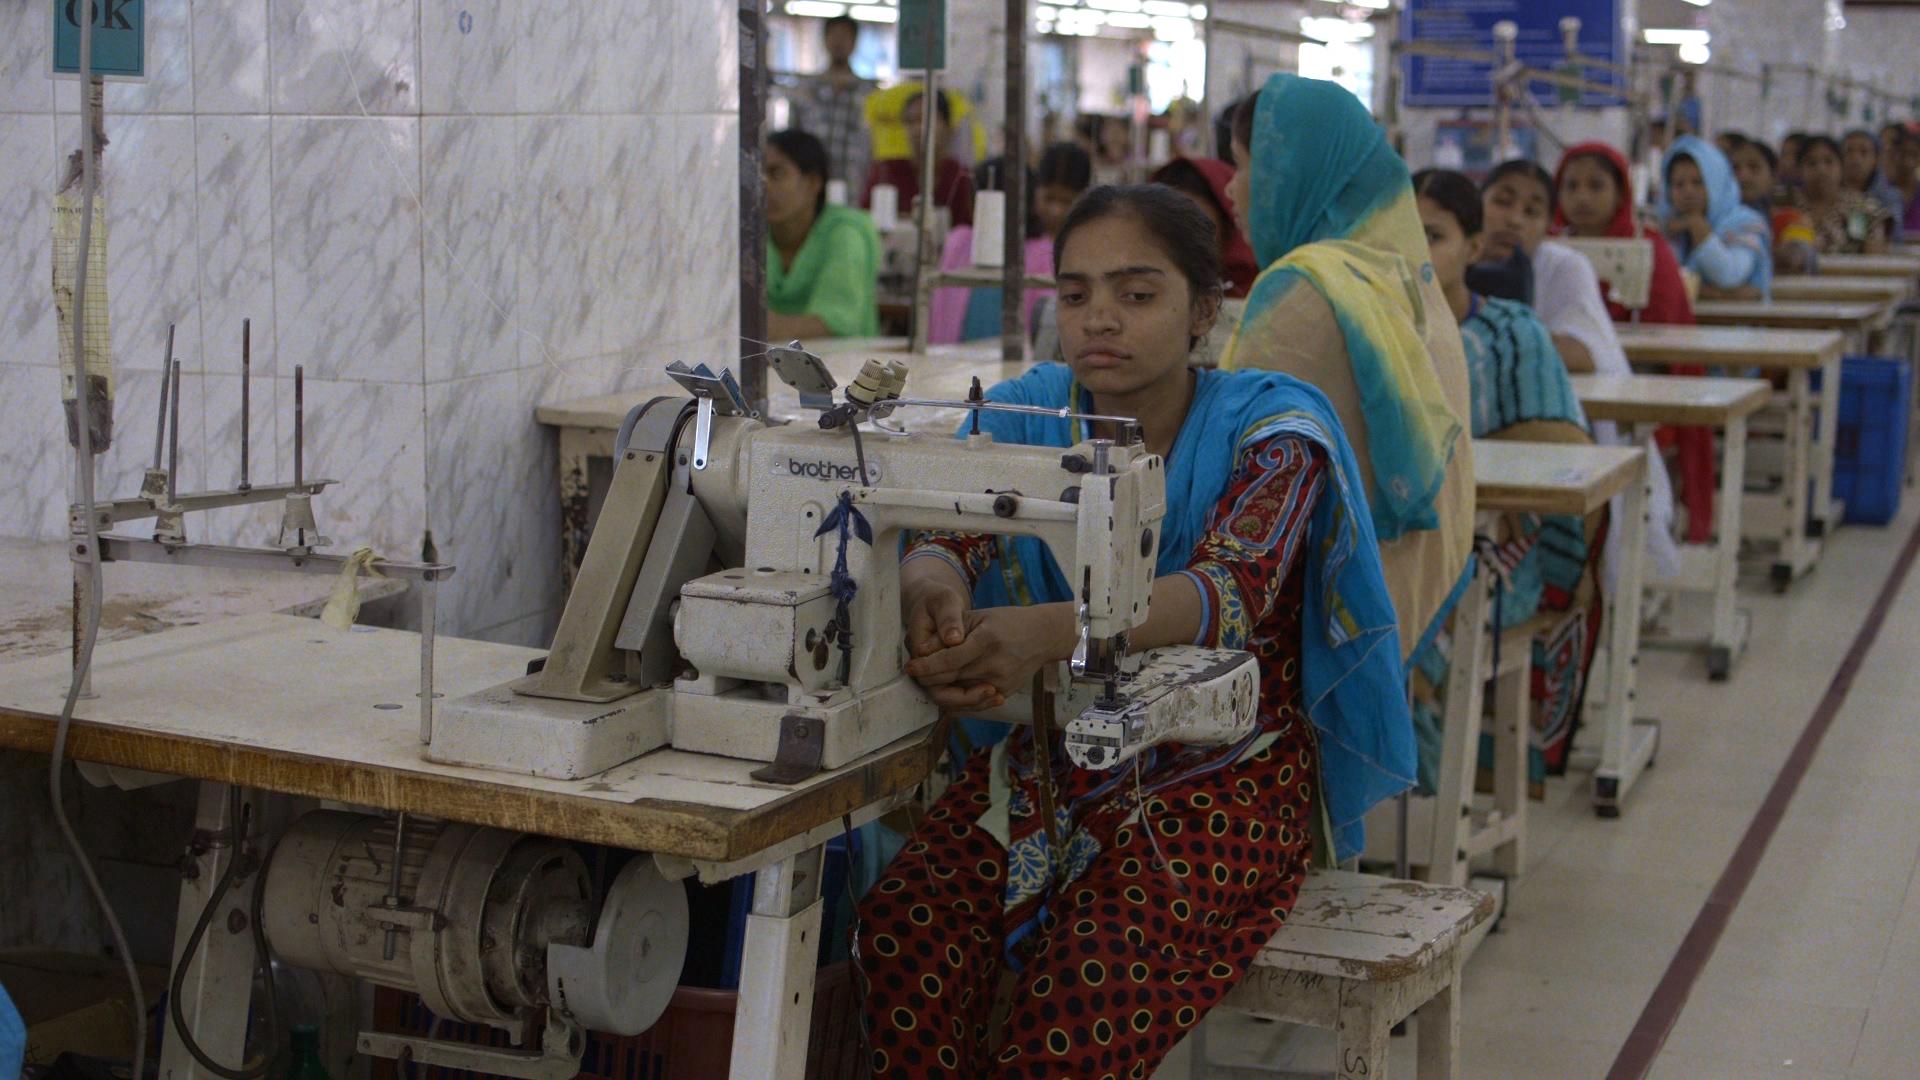 Bangladeshi garment workers. Image credit: www.truecostmovie.com